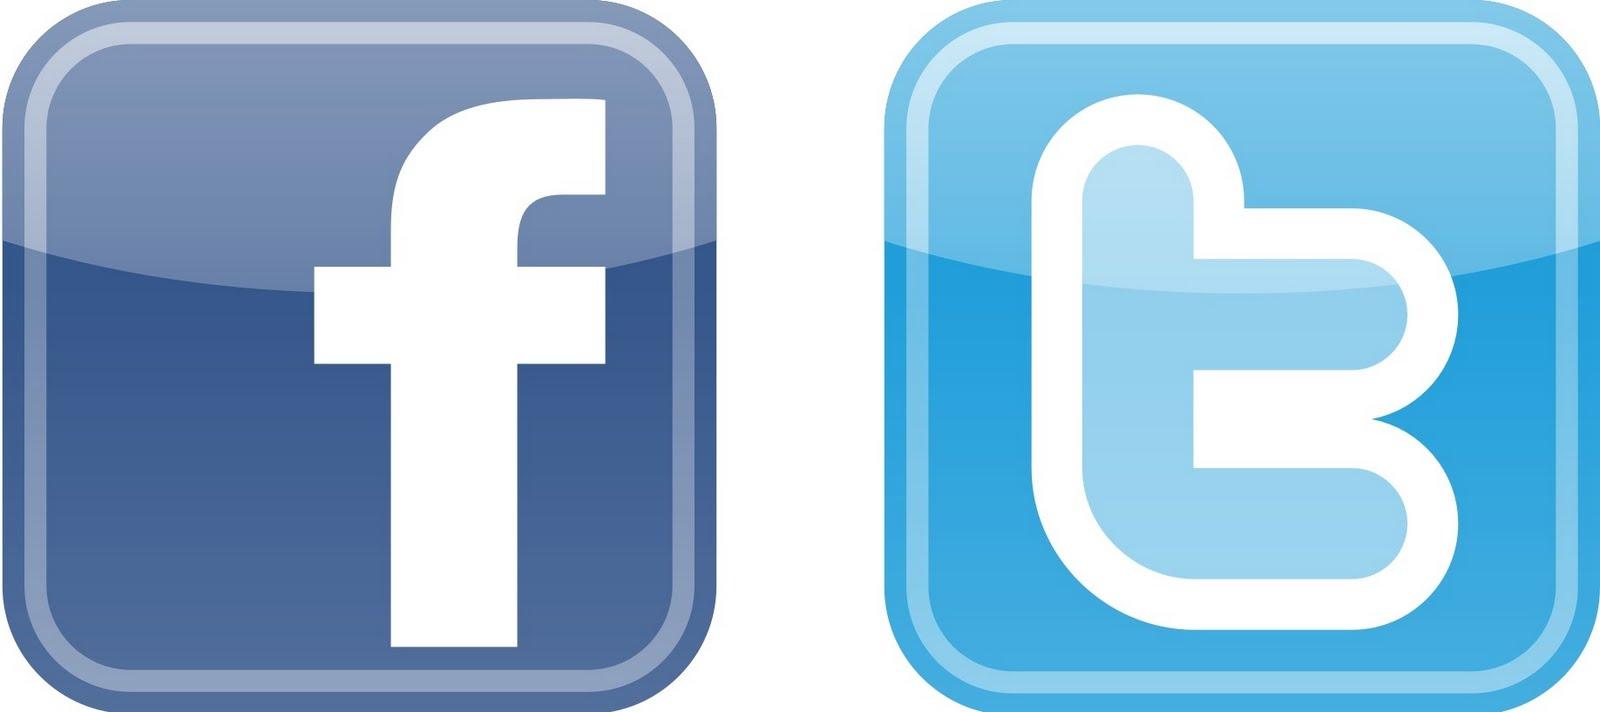 Facebook Platform  Wikipedia